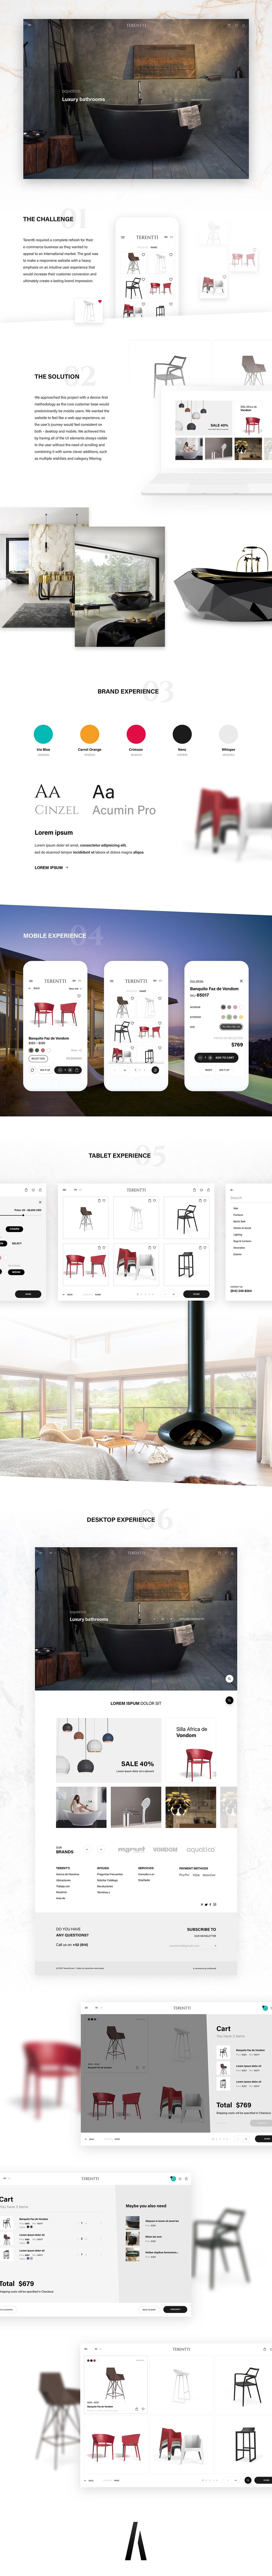 luxury Ecommerce e-commerce Web Website Web Design  web development  product furniture interior design